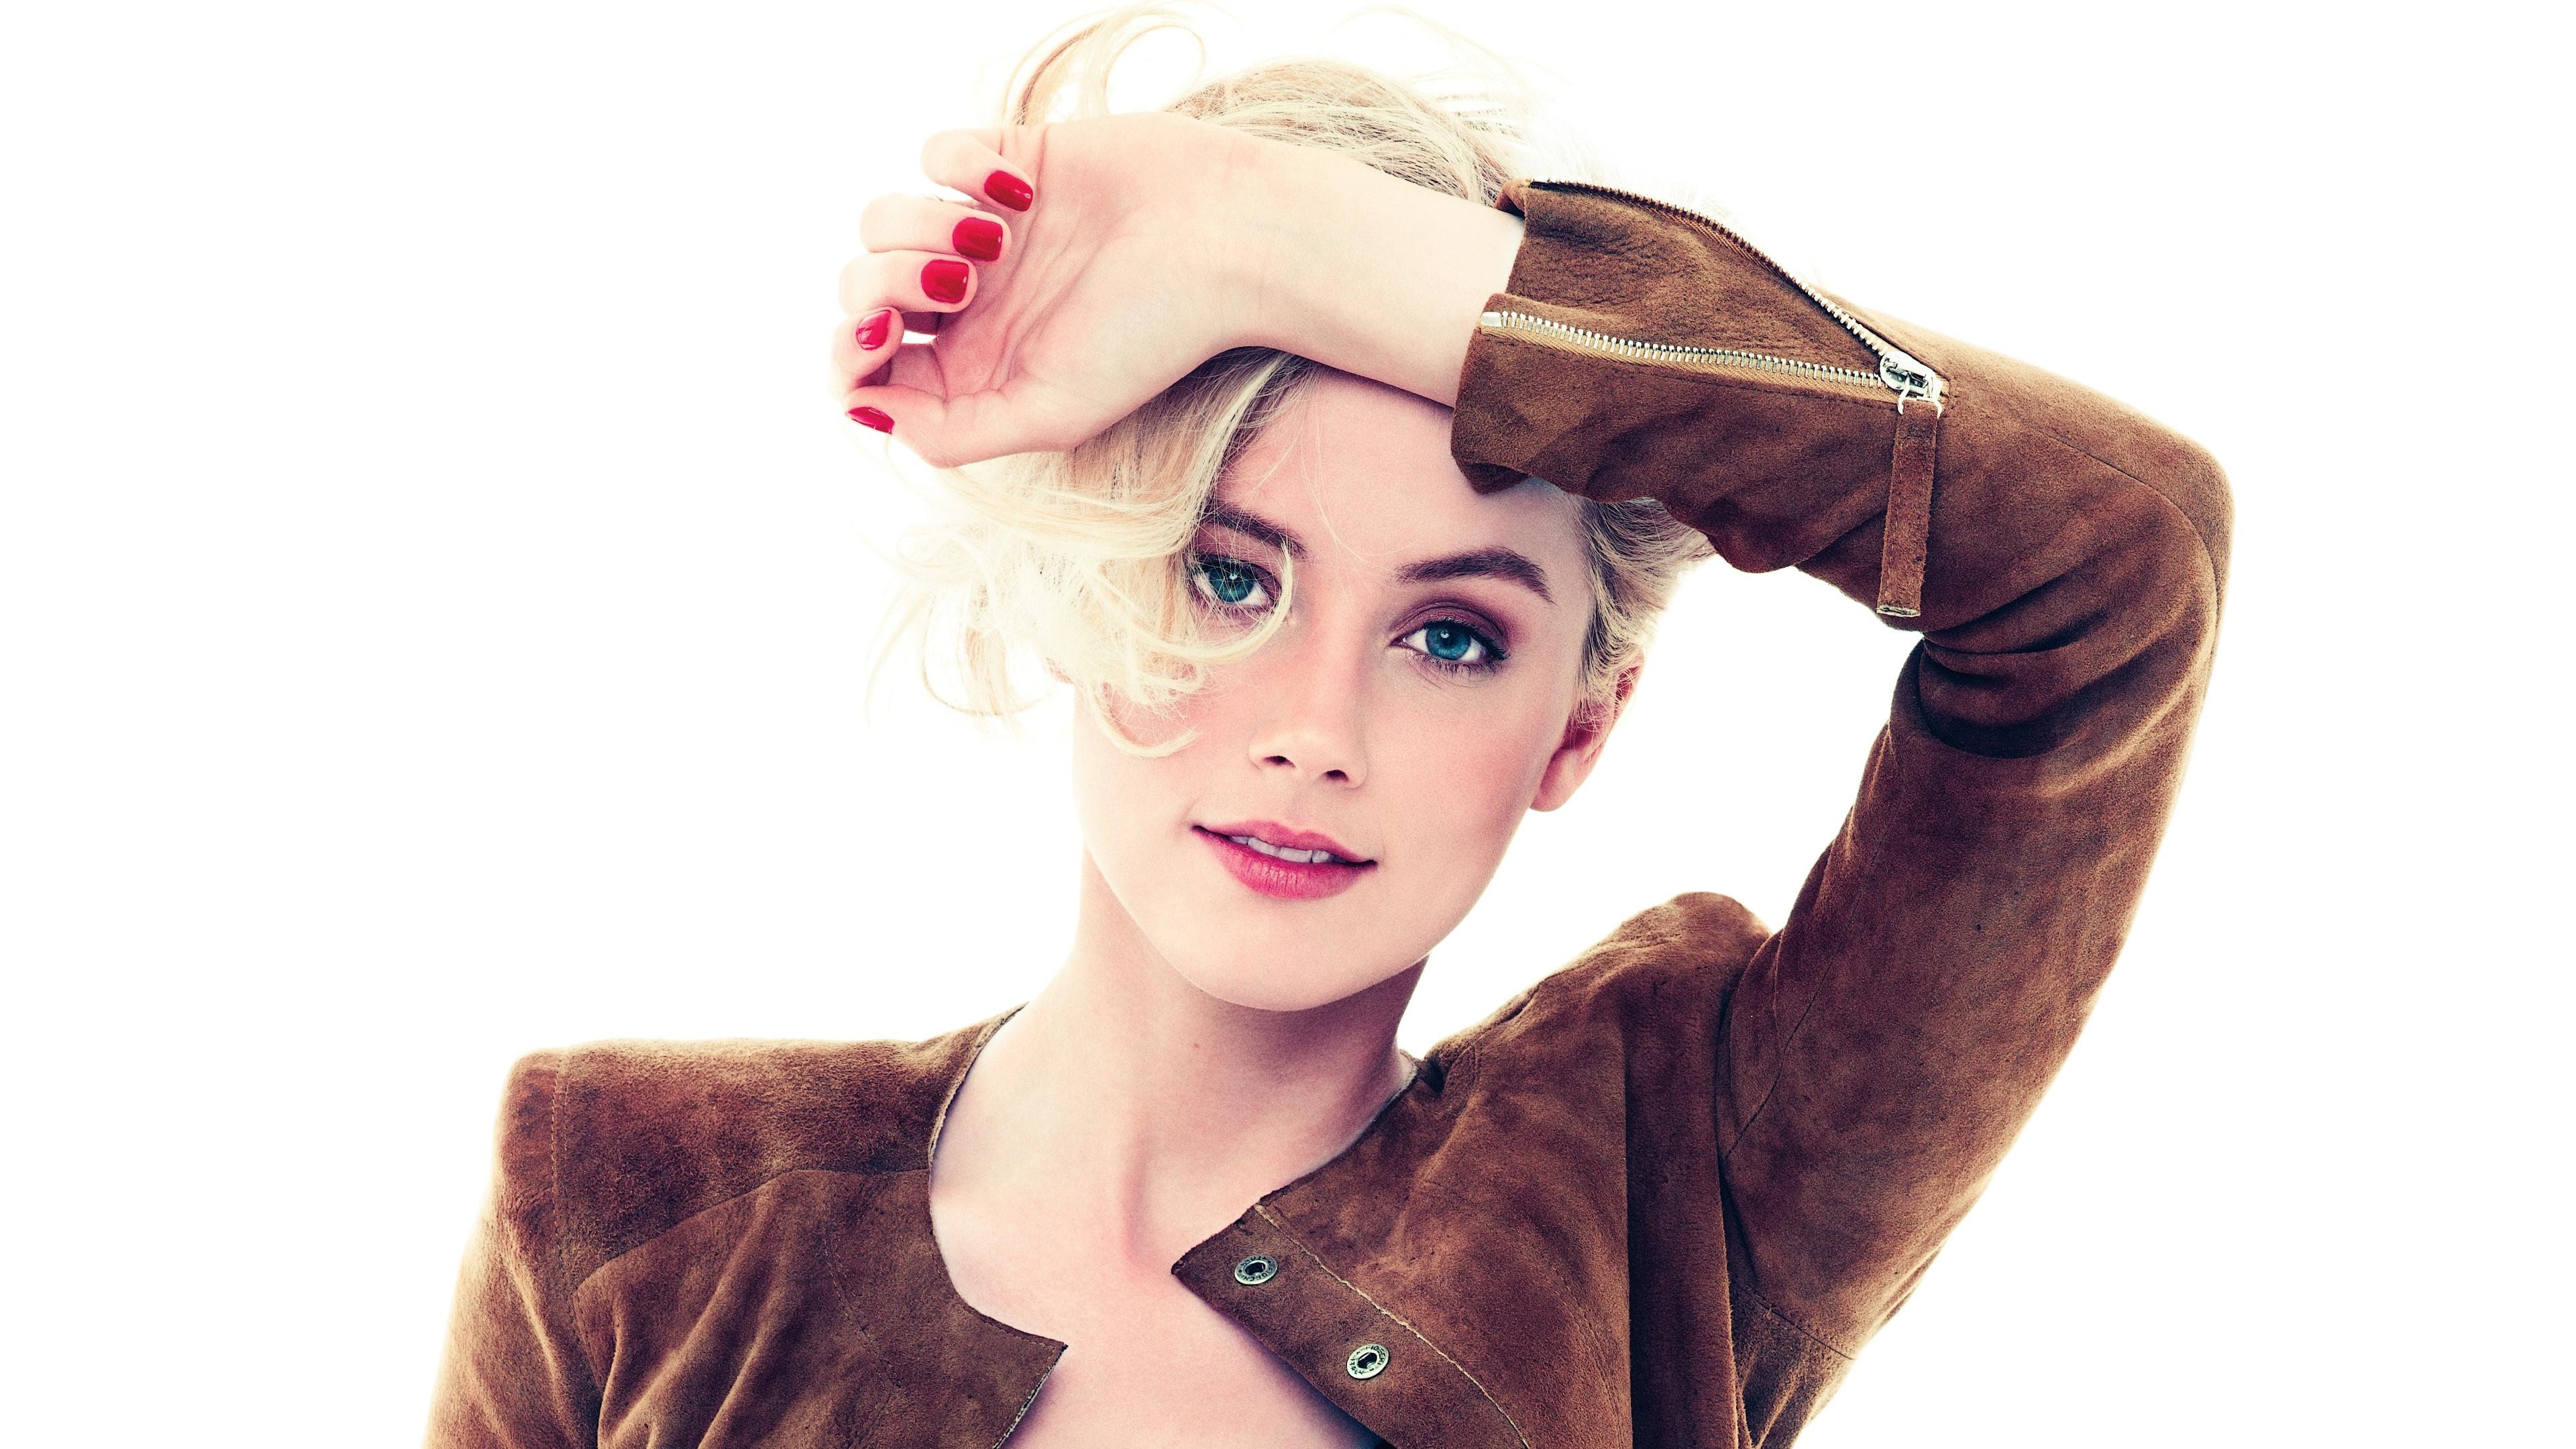 amber heard 2019 5k latest 1536952279 - Amber Heard 2019 5k Latest - hd-wallpapers, girls wallpapers, celebrities wallpapers, amber heard wallpapers, 5k wallpapers, 4k-wallpapers